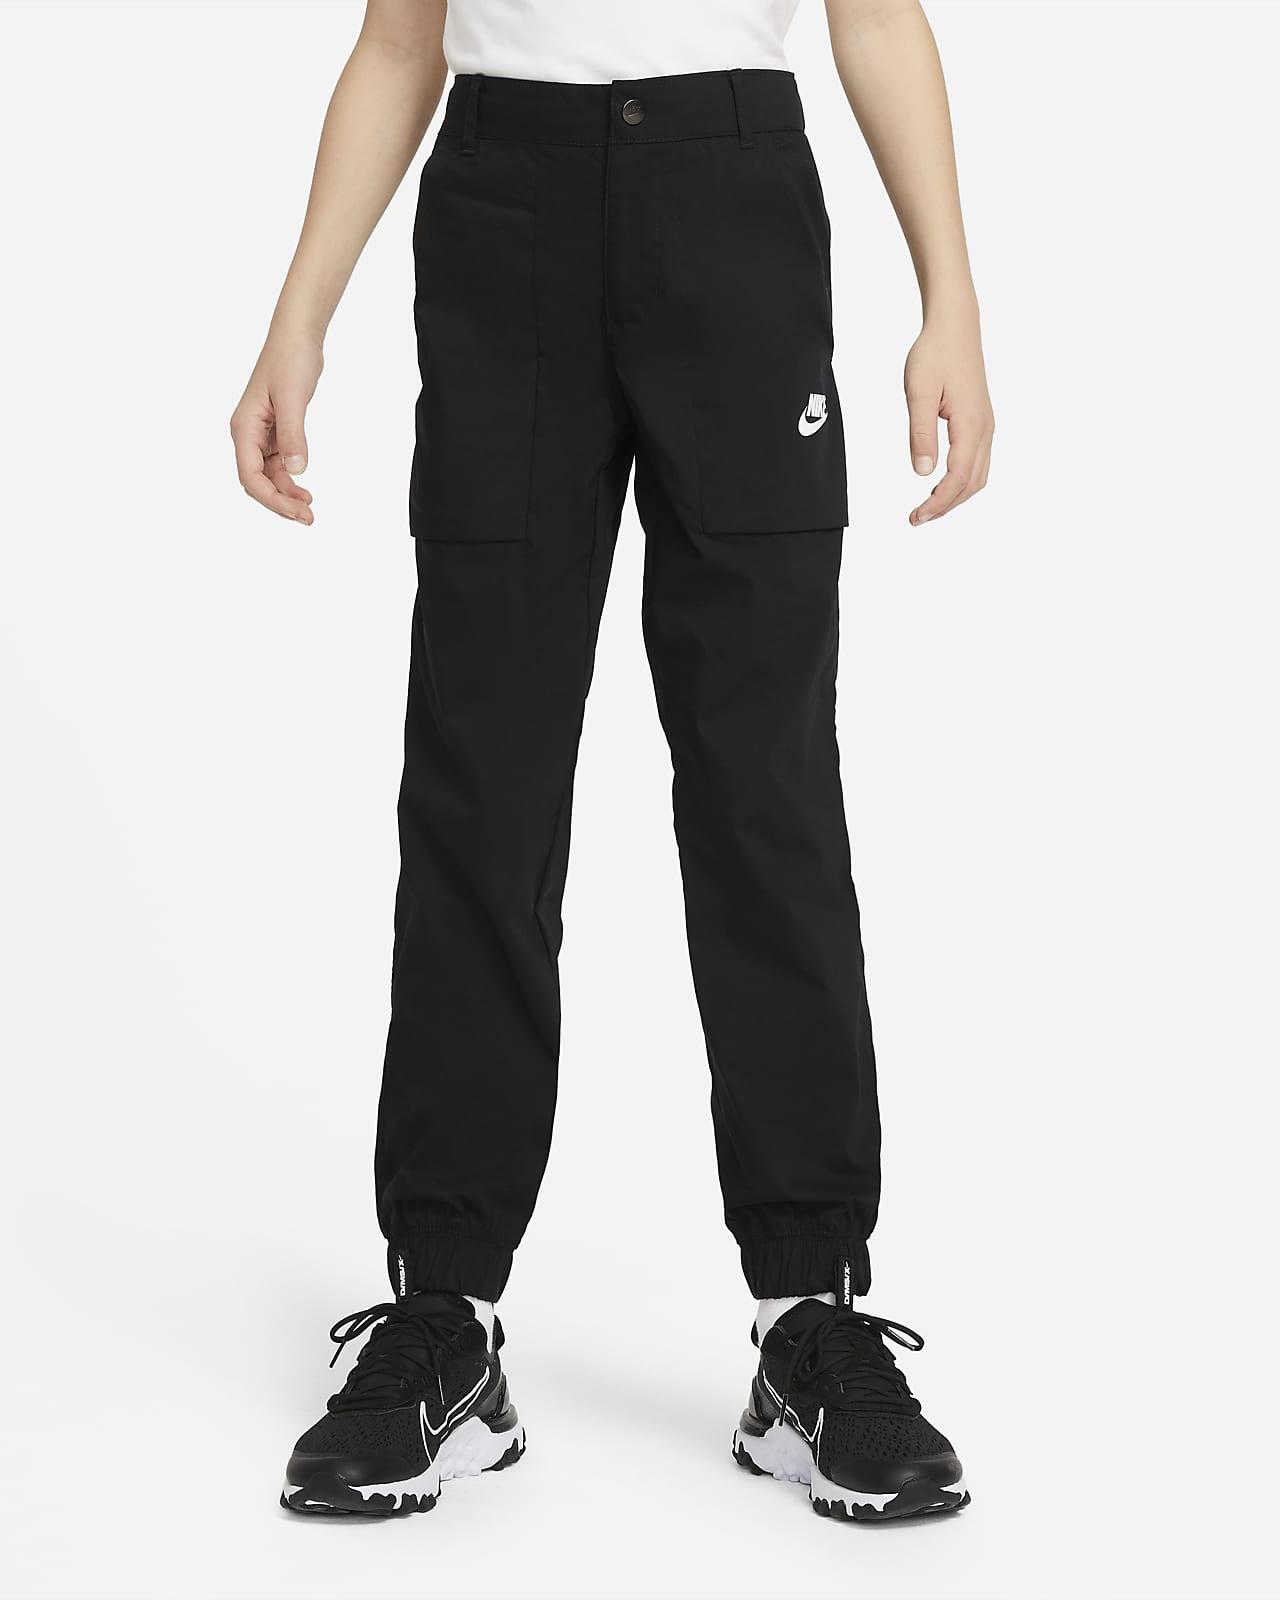 Nike Sportswear 大童(男孩)梭织工装长裤